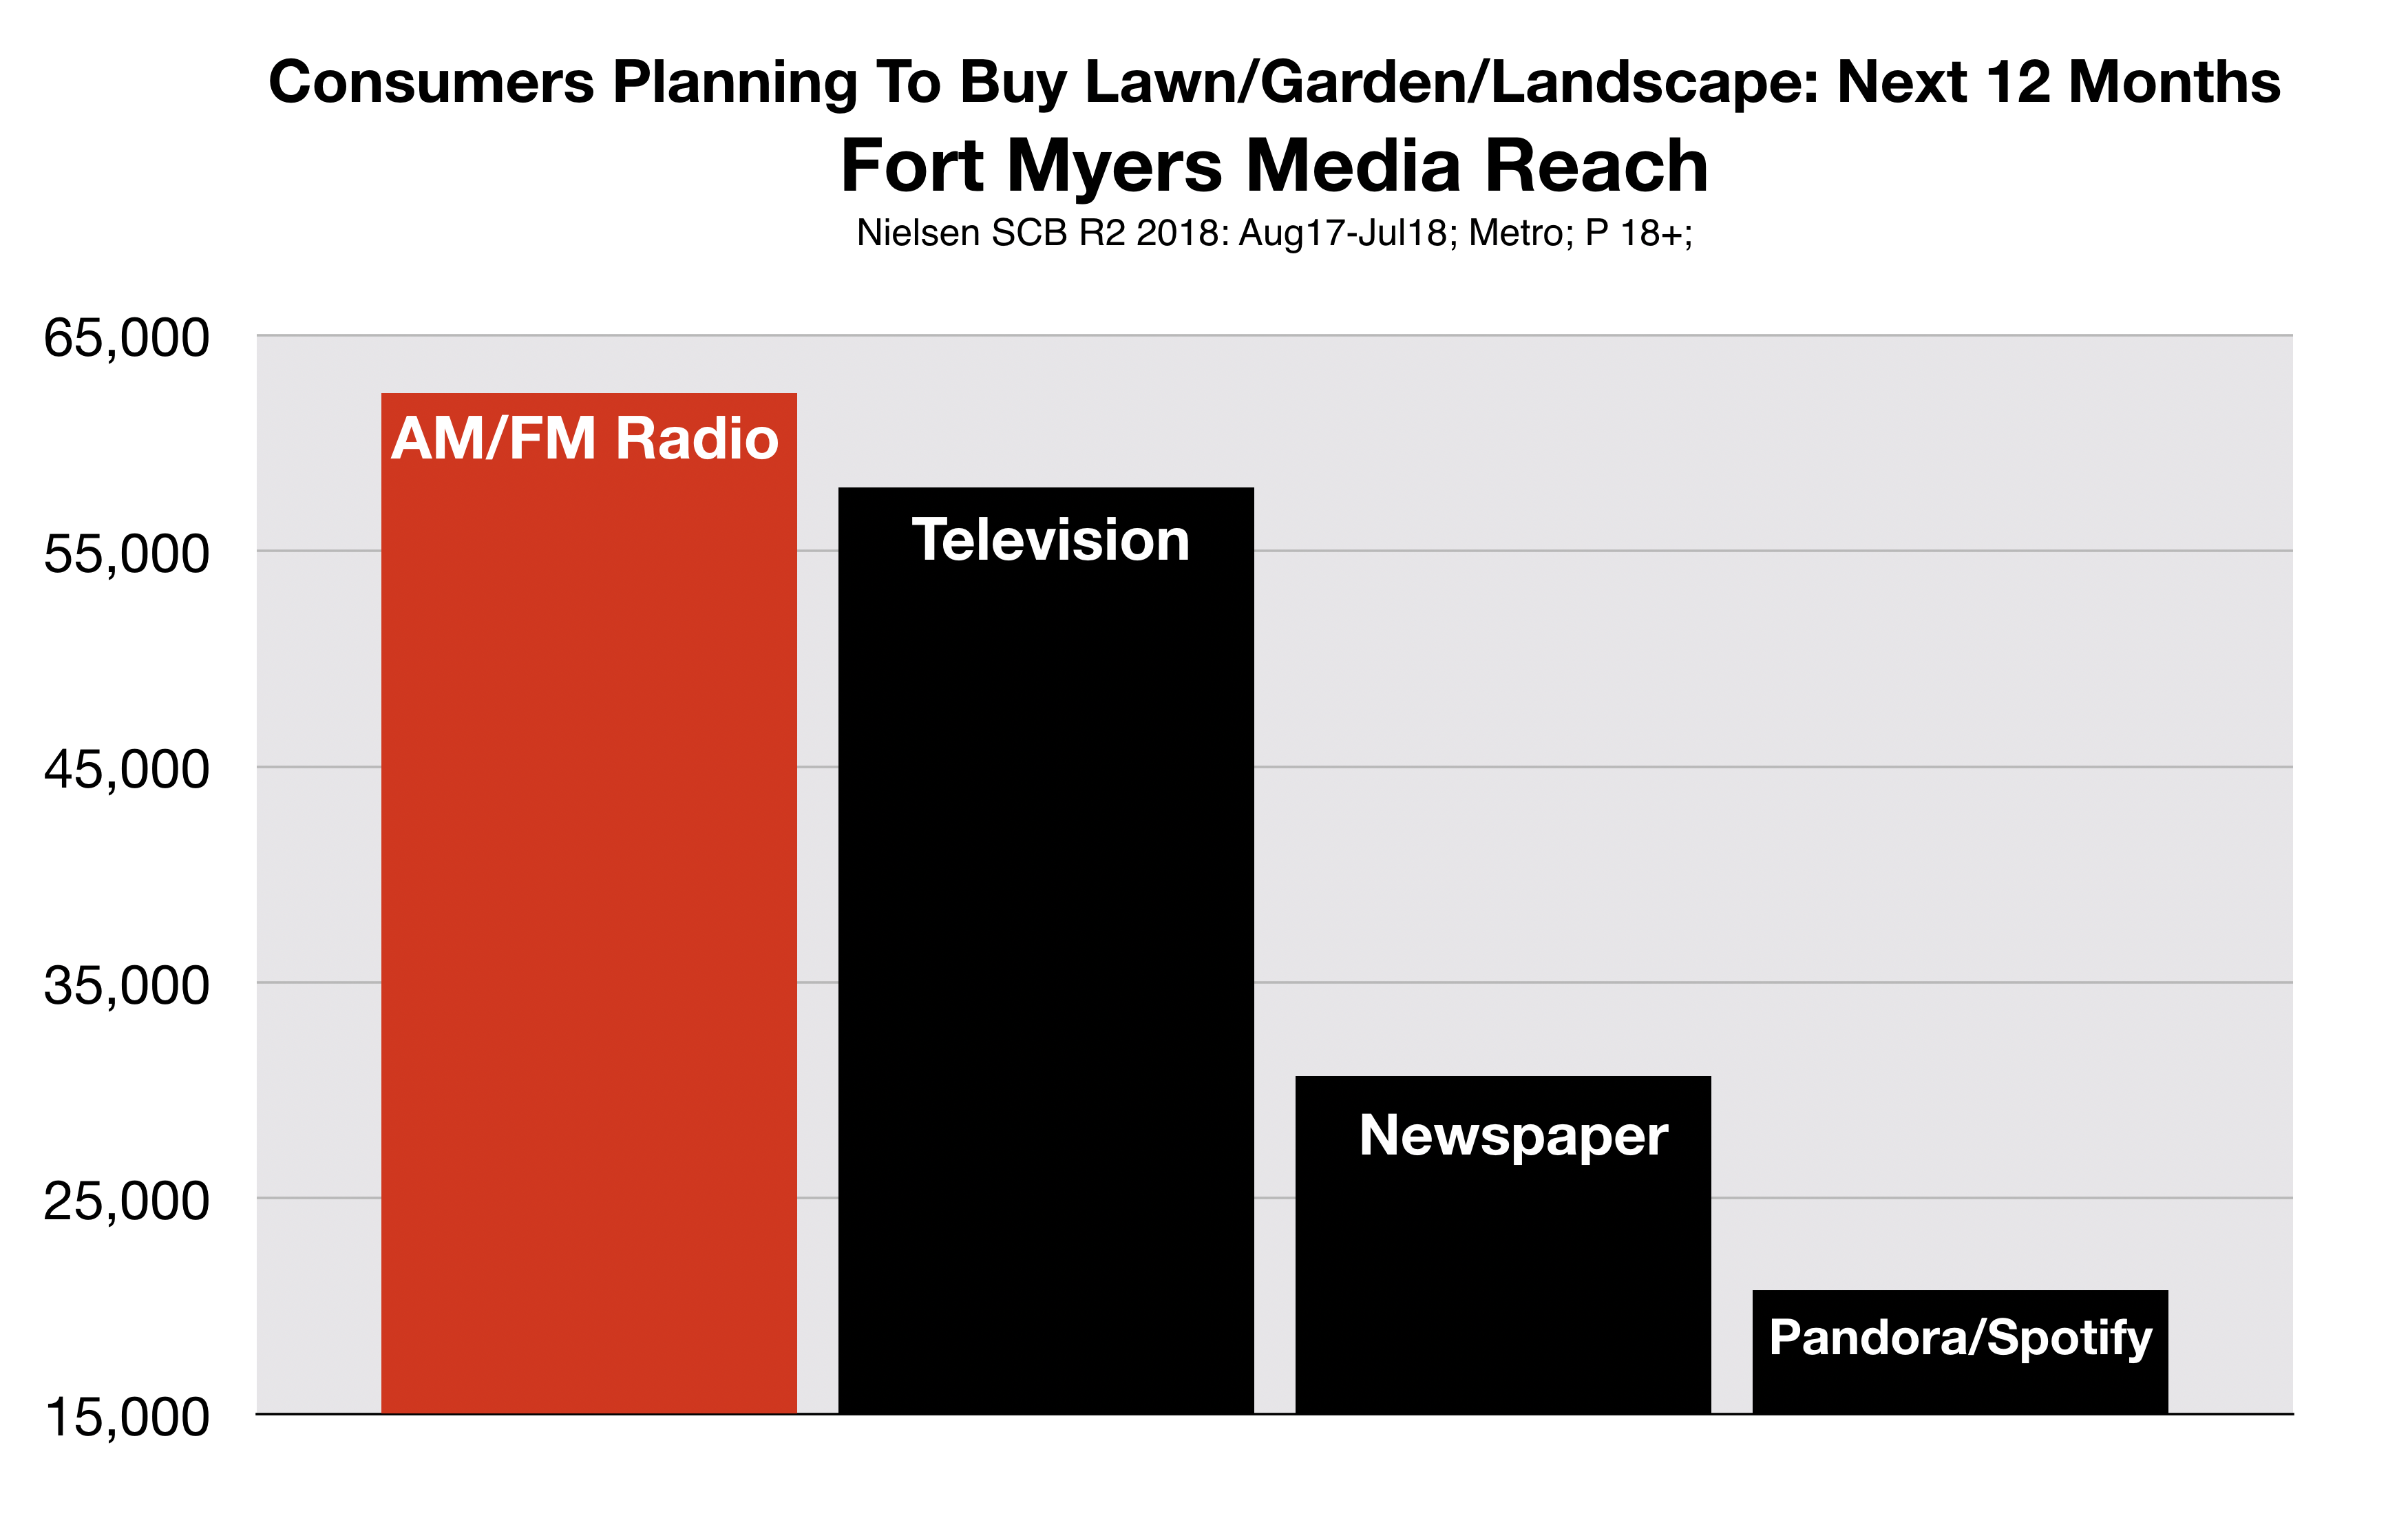 Advertise in Fort Myers Lawn Garden Landscape